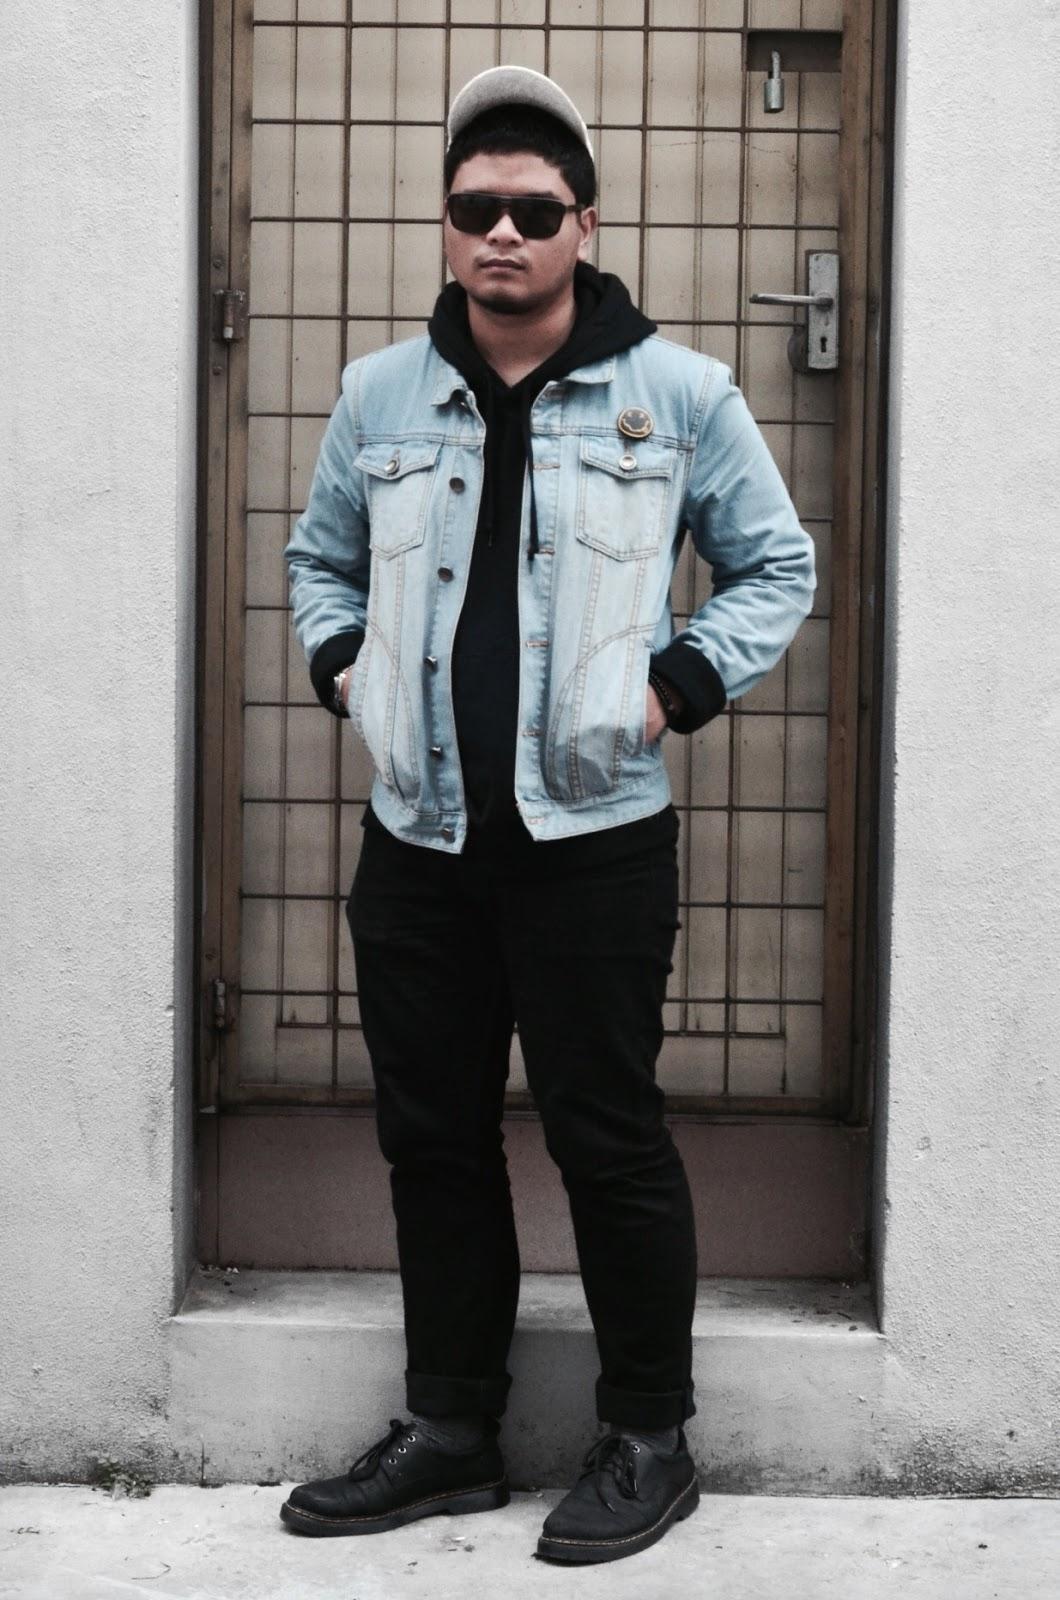 White Cap COTTON ON // Sunglasses DIOR HOMME // Hoodie UNIQLO // Denim  Jacket SEED // Watch SEIKO // Rings MAKKAH // Jeans H&M // Socks FOREVER21  // Shoes ... - Of Denim & Hoodie Blankologie